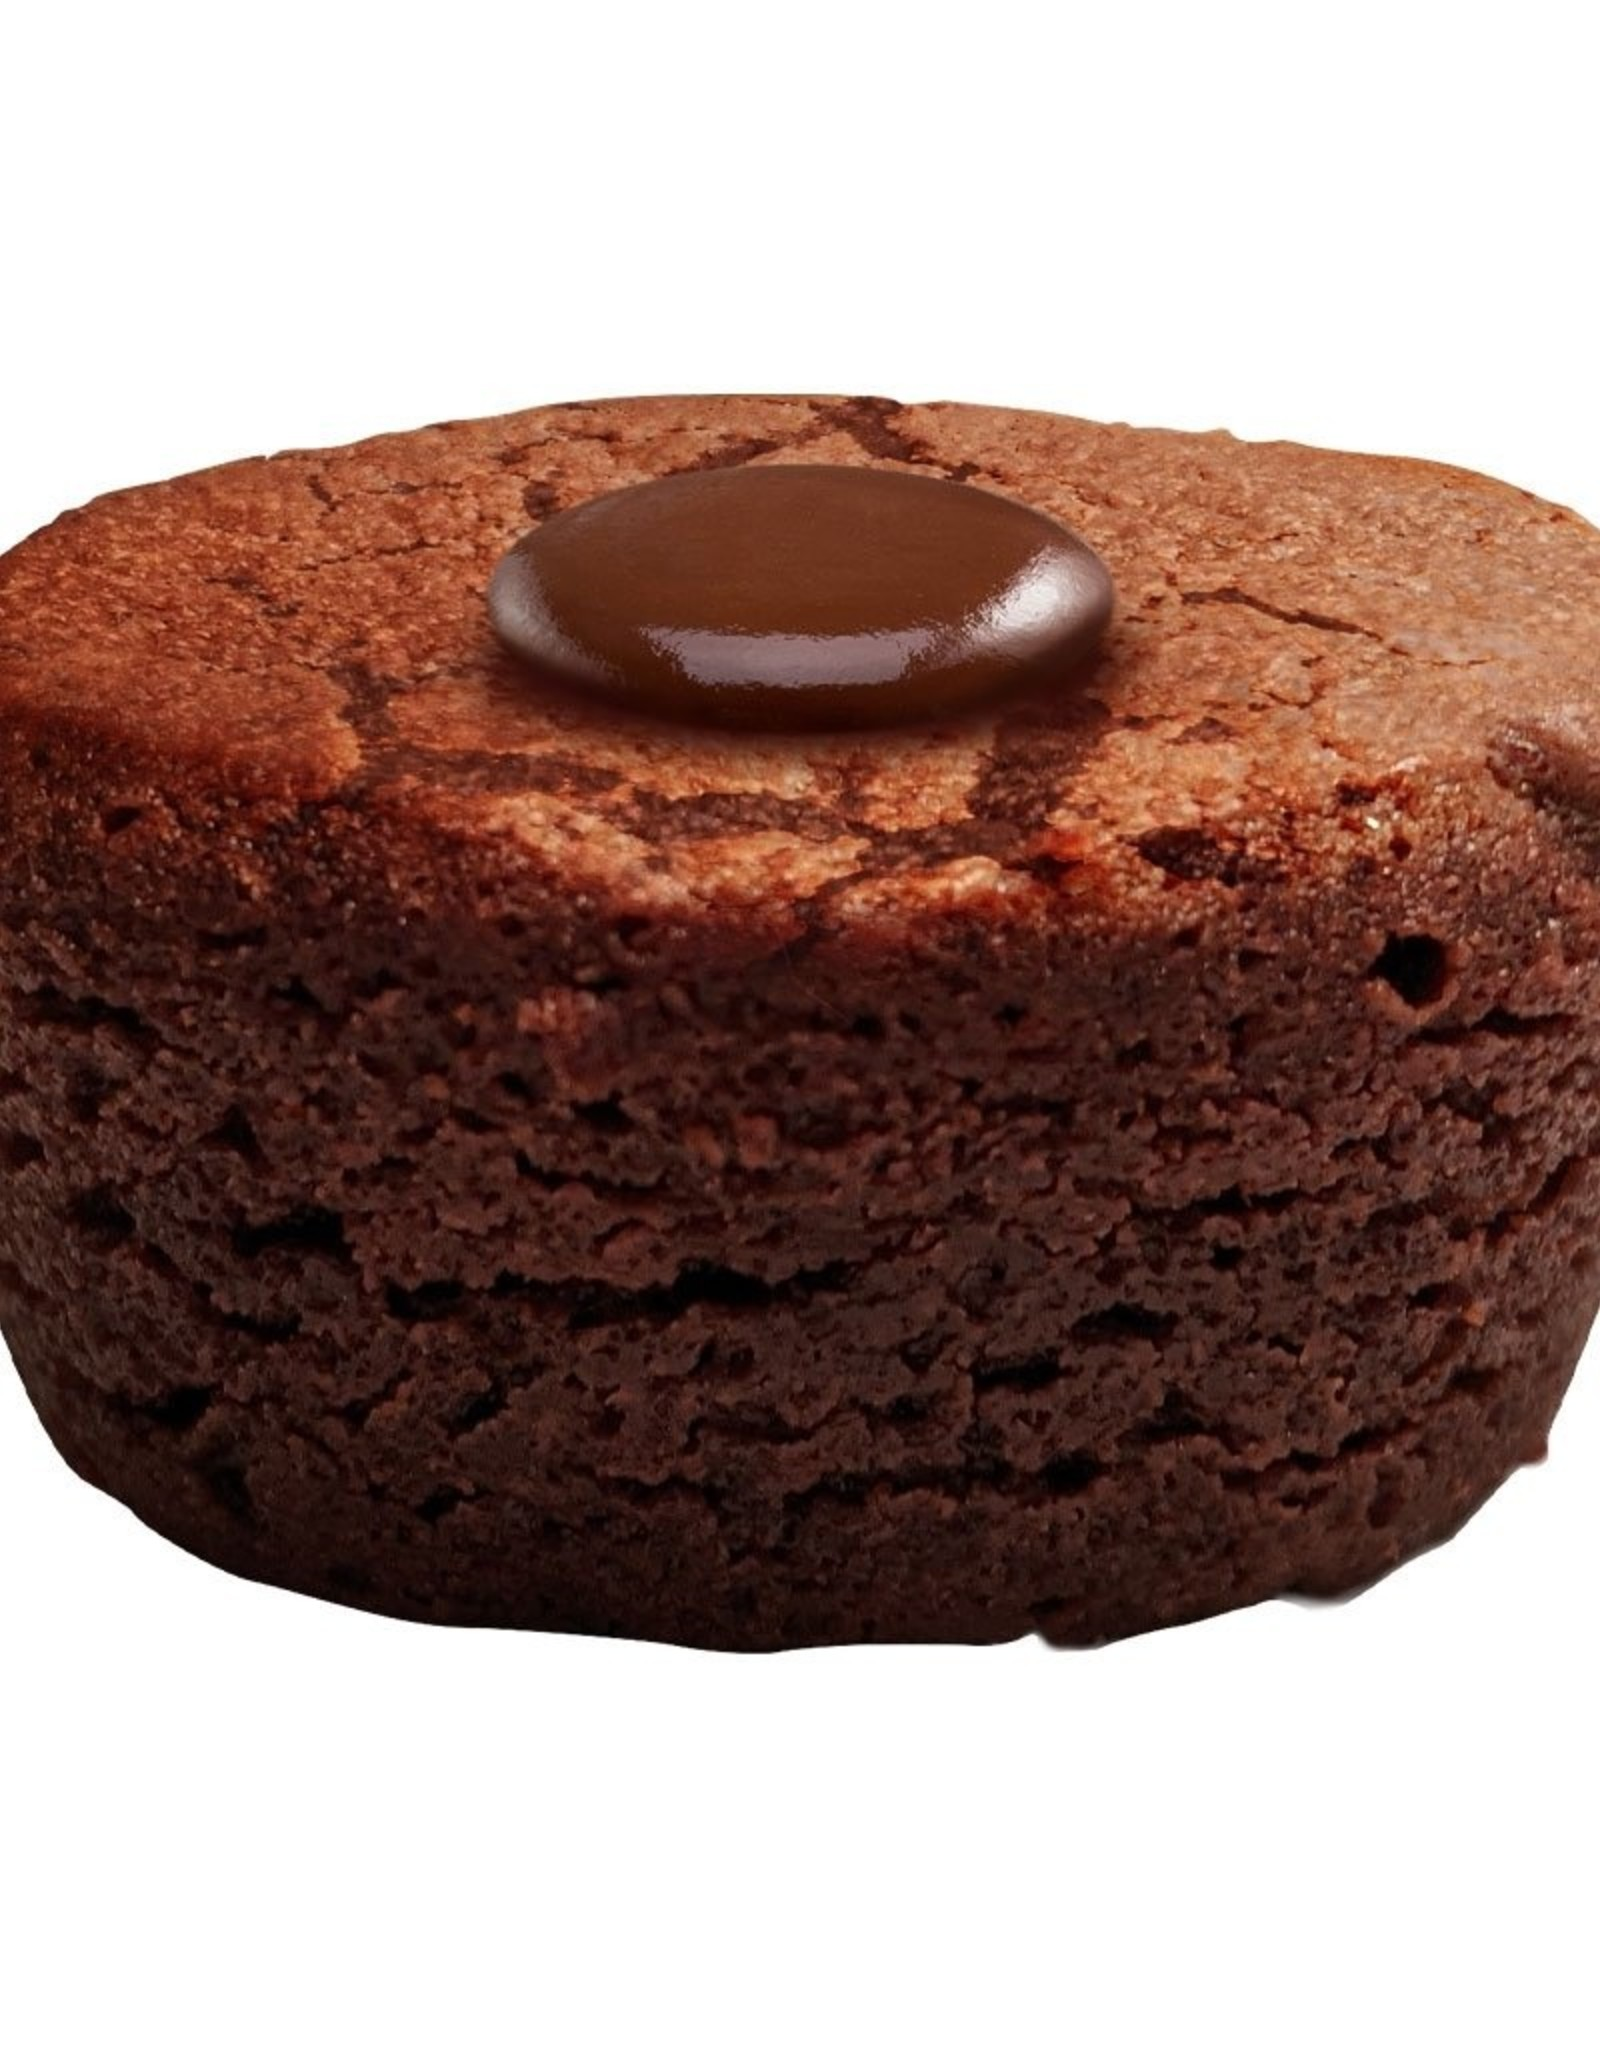 Verse Originals Verse - Double Chocolate Brownie